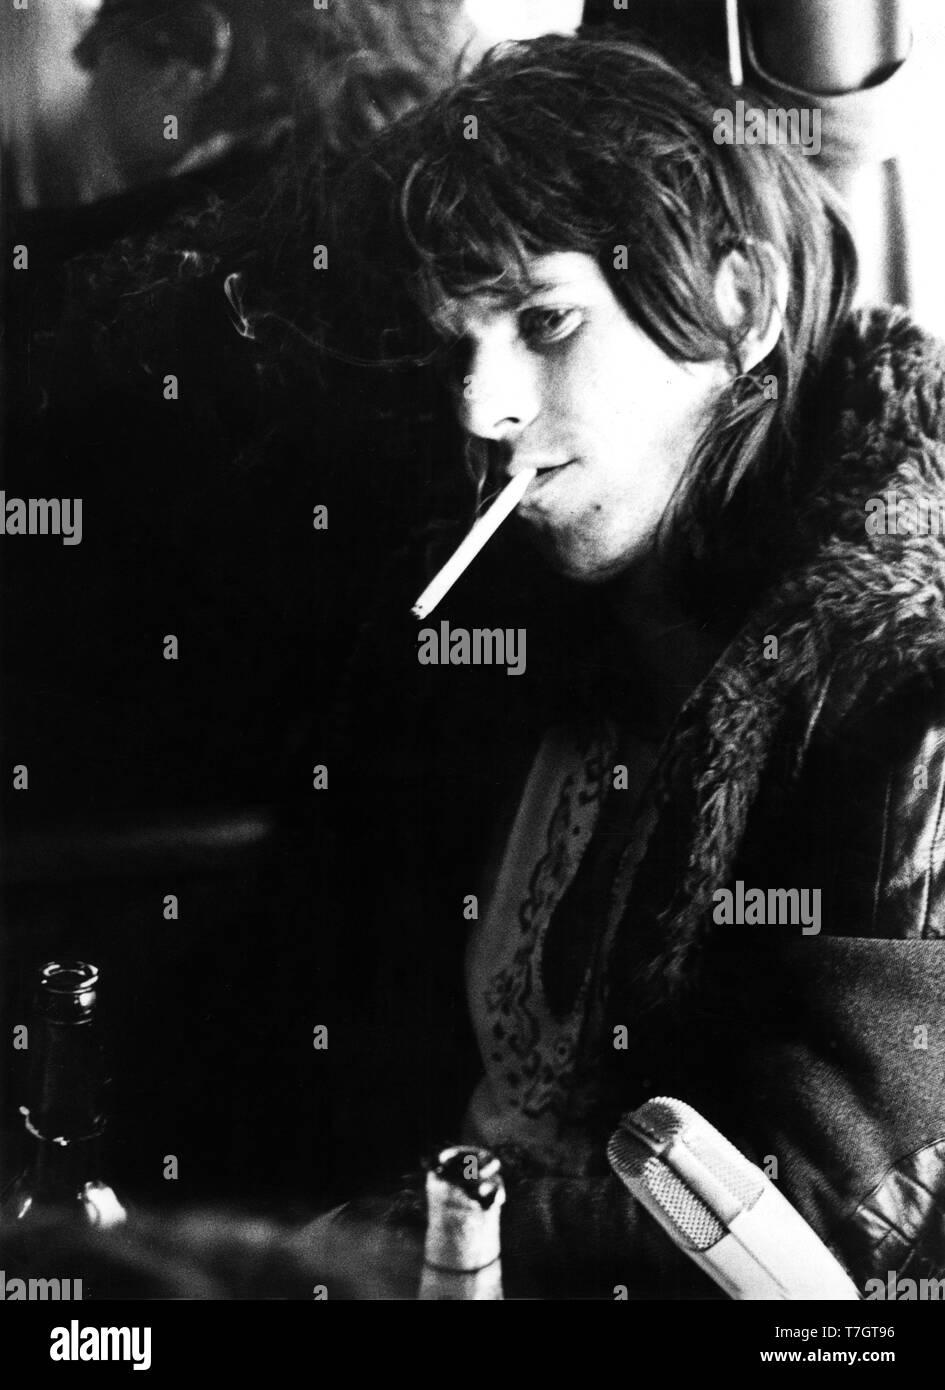 1970 september 13th, Hamburg  , Germany - 1970,  (Photo Gijsbert Hanekroot) - Stock Image